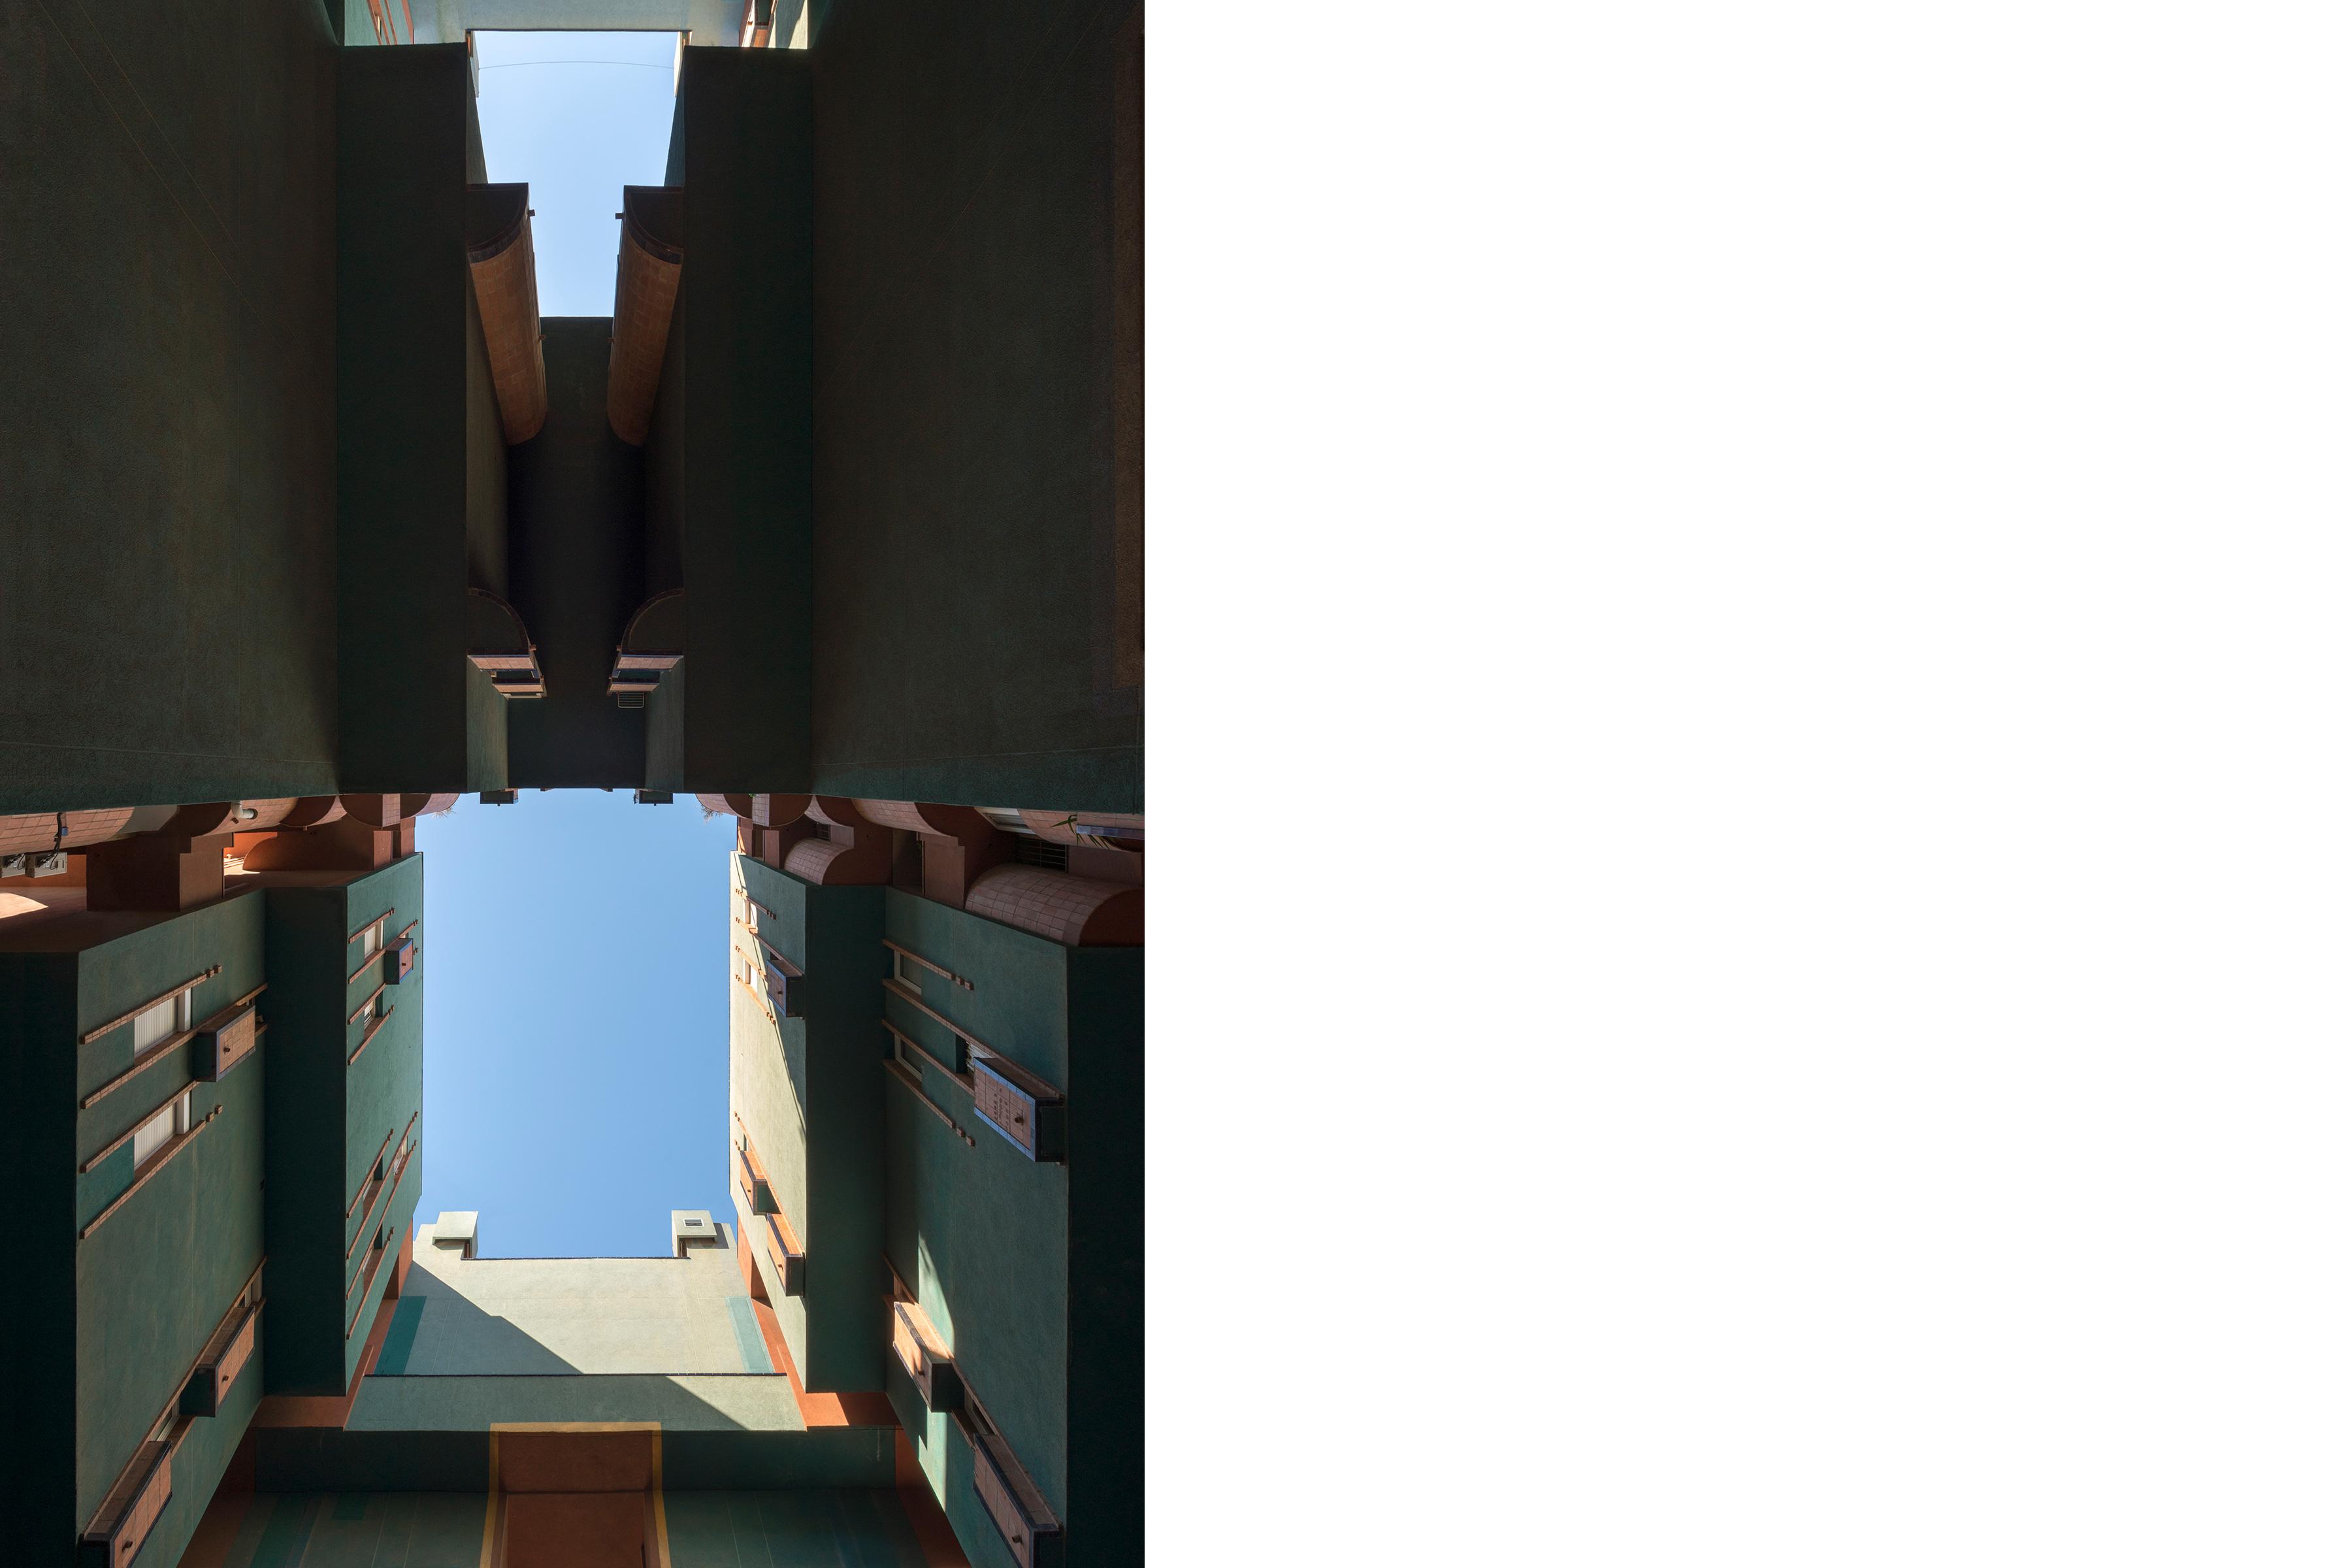 Architectural photography of Walden 7 in Barcelona by Ricardo Bofill | Dario Lanfranconi 2019